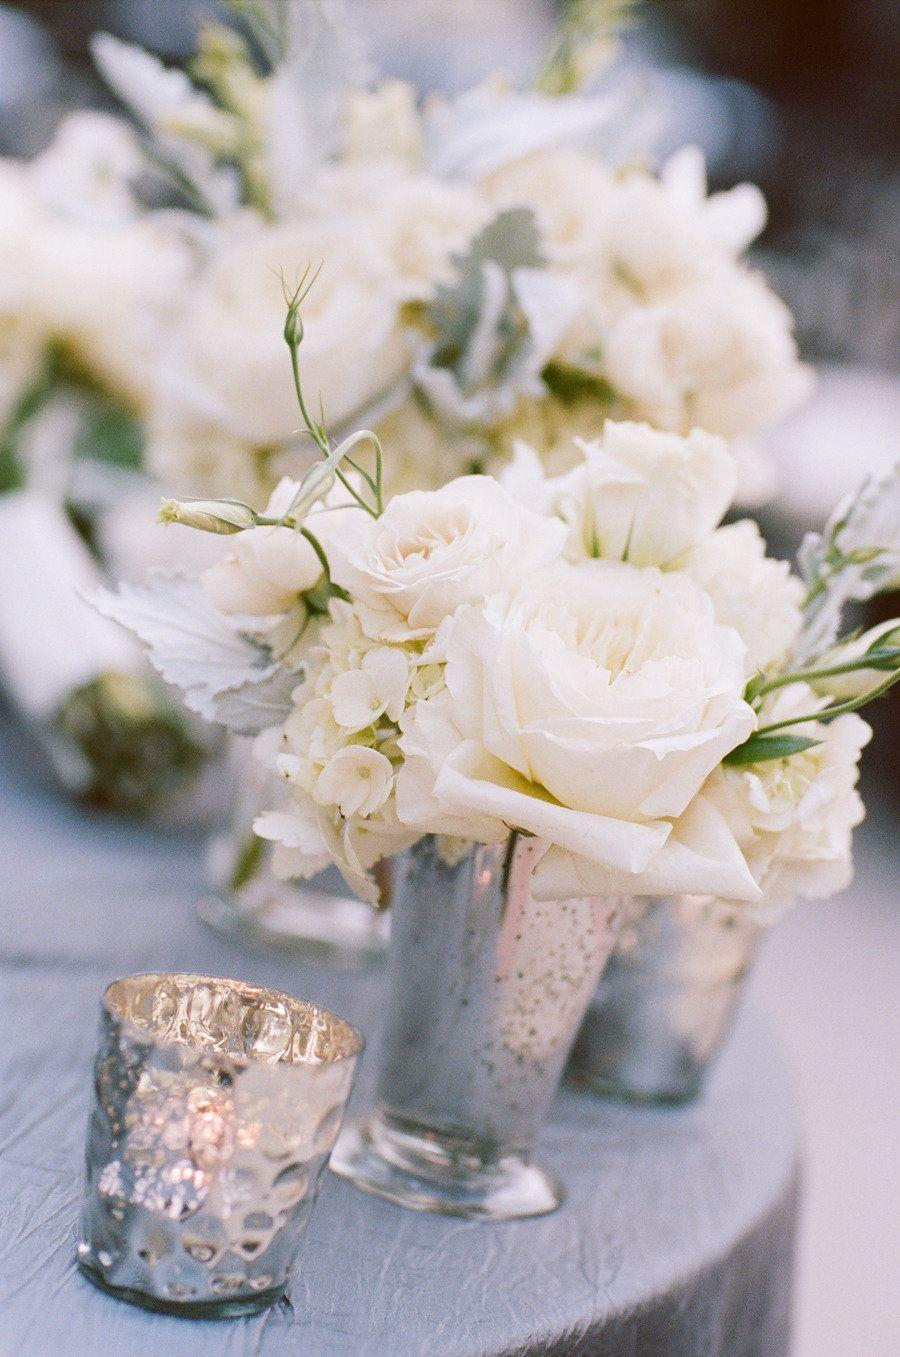 Flowers By Peonyandplum Photography By Picotteweddings